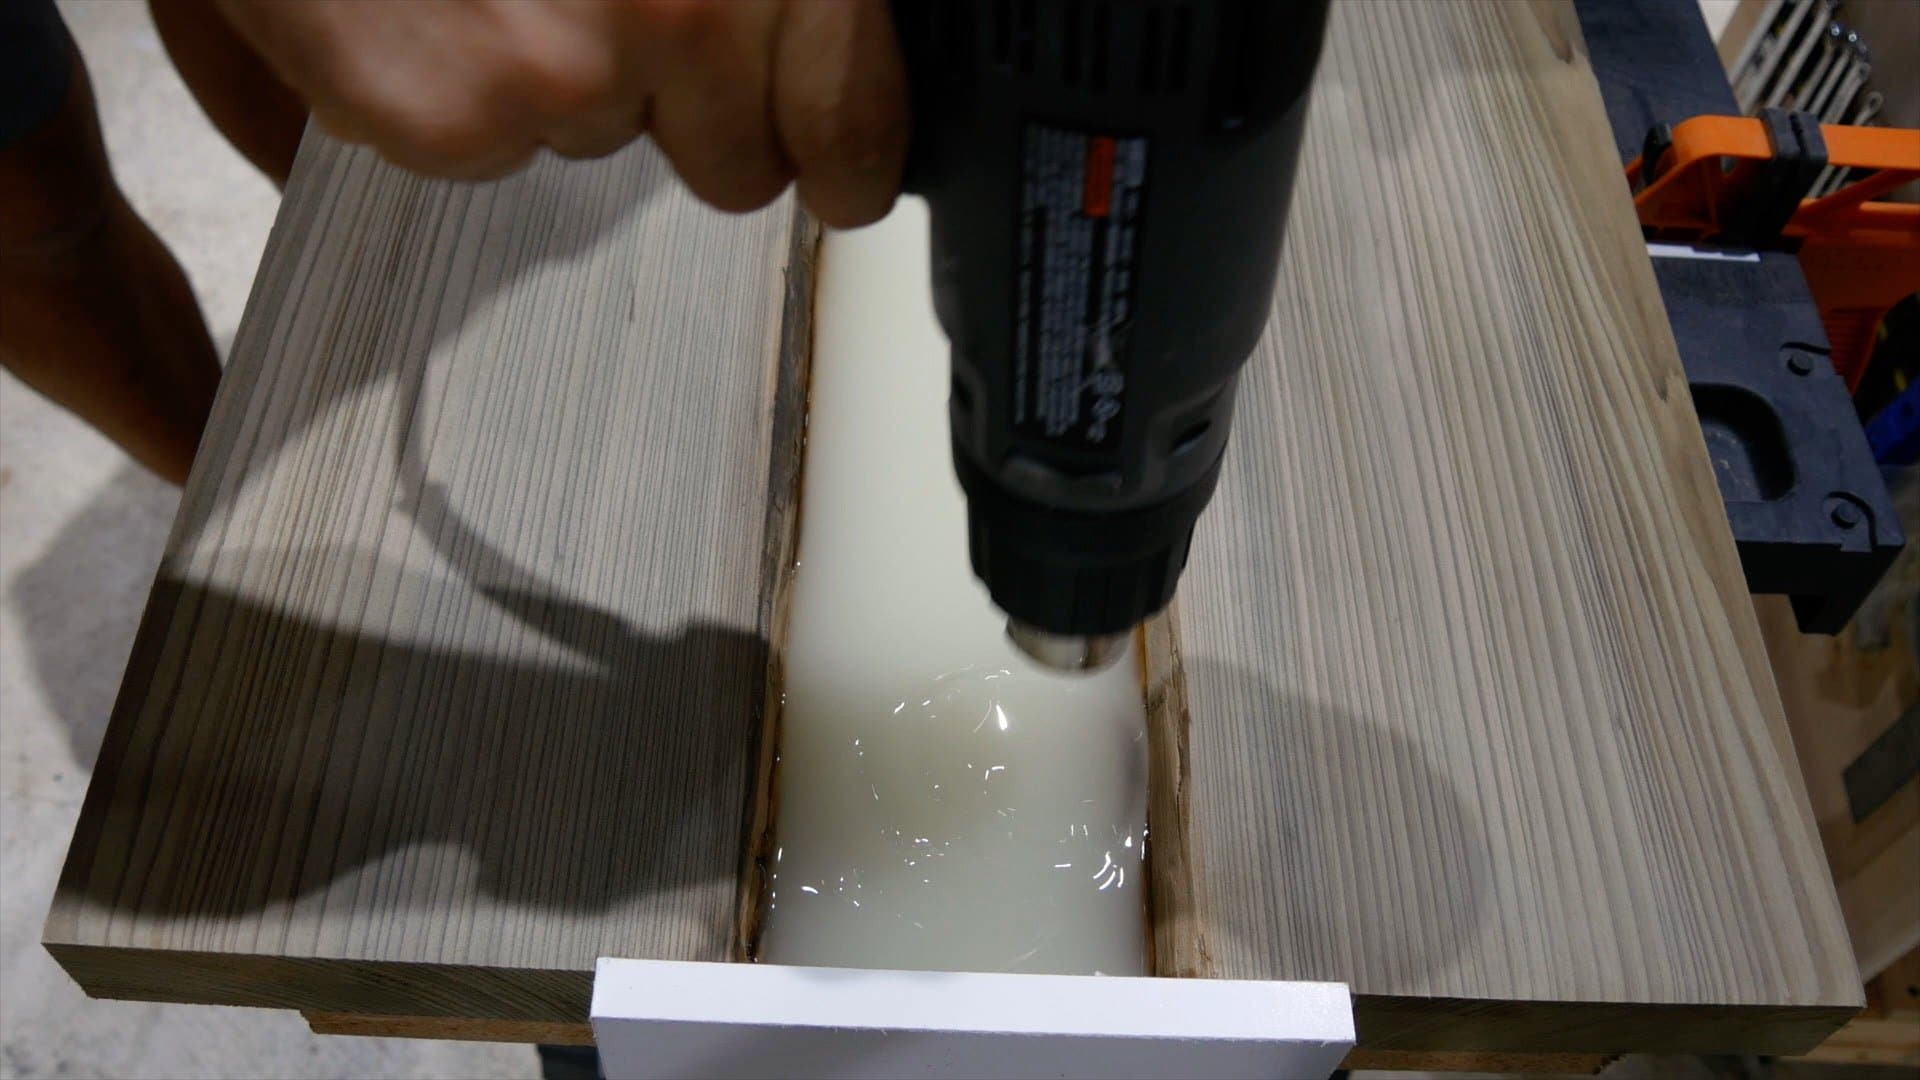 epoxy-resin-river-table-glowpowder_20171016_39